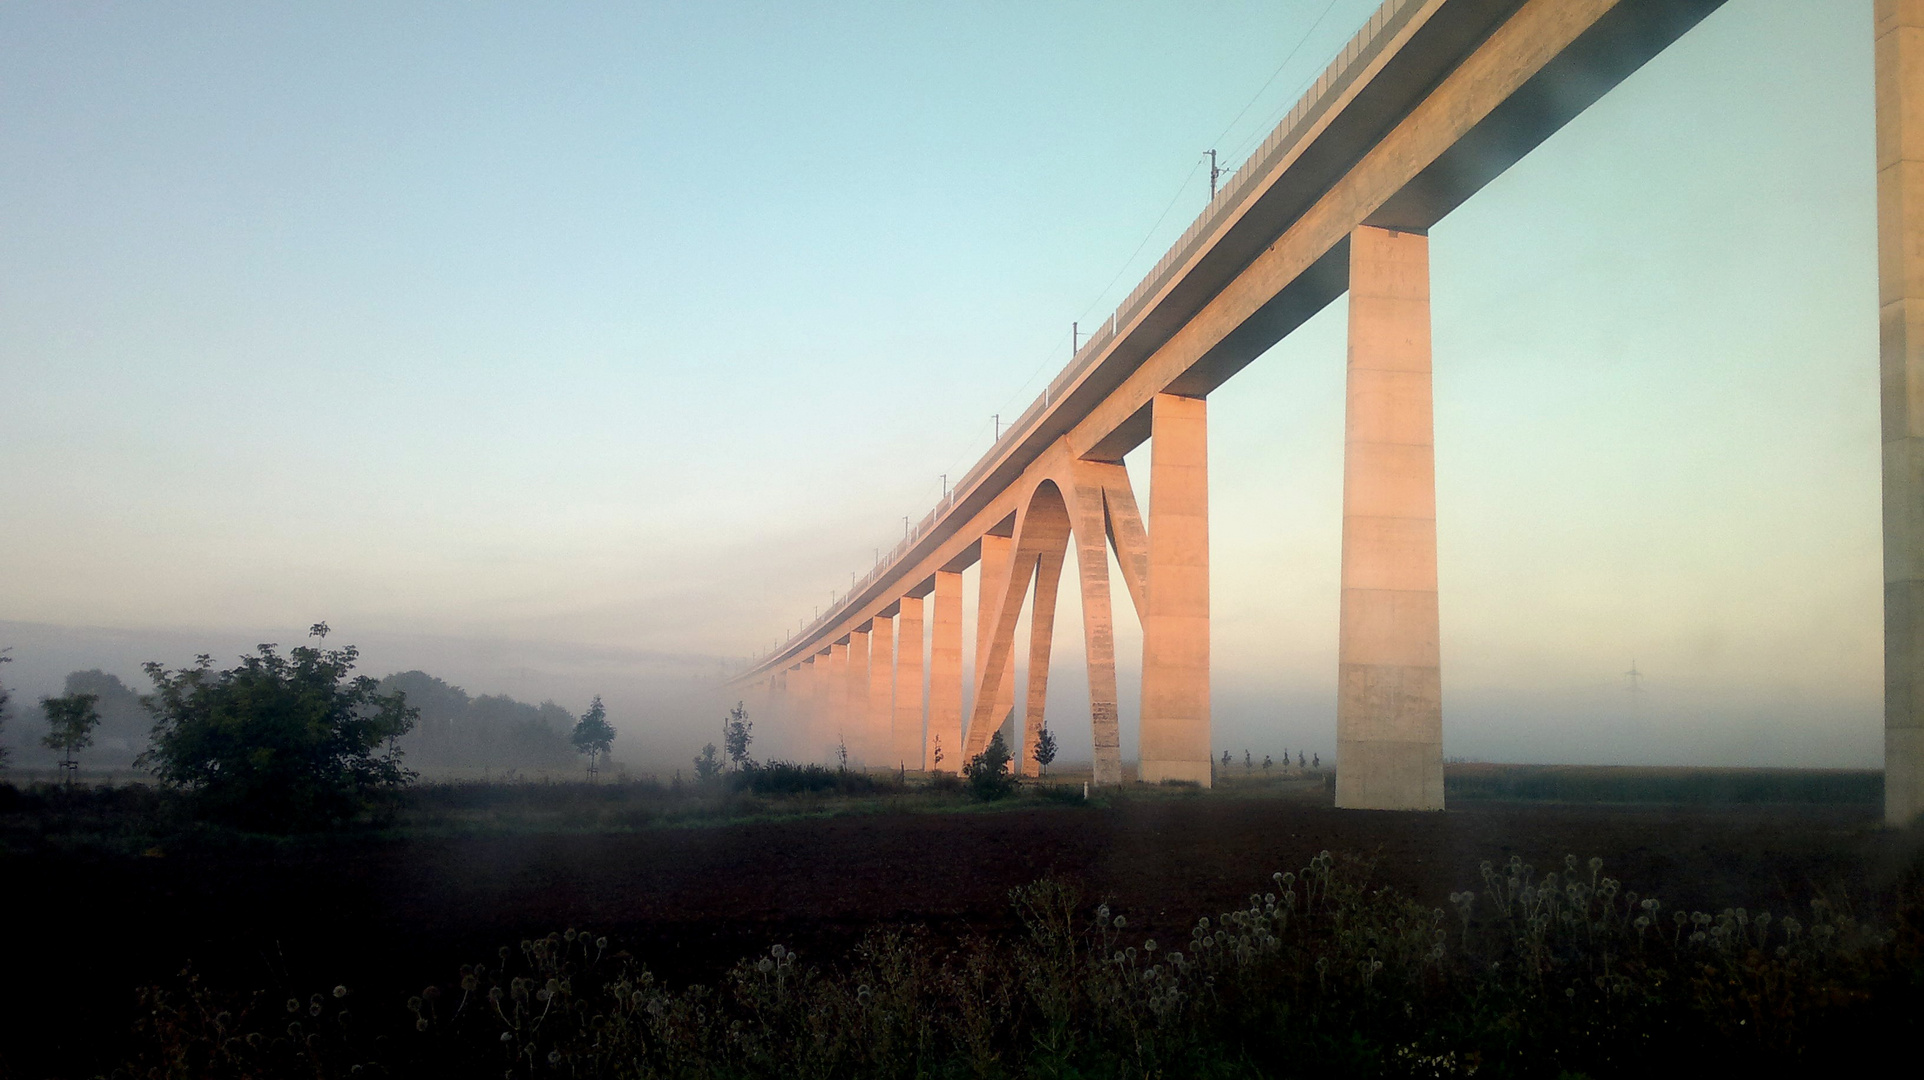 Neue Eisenbahnbrücke bei Nebra